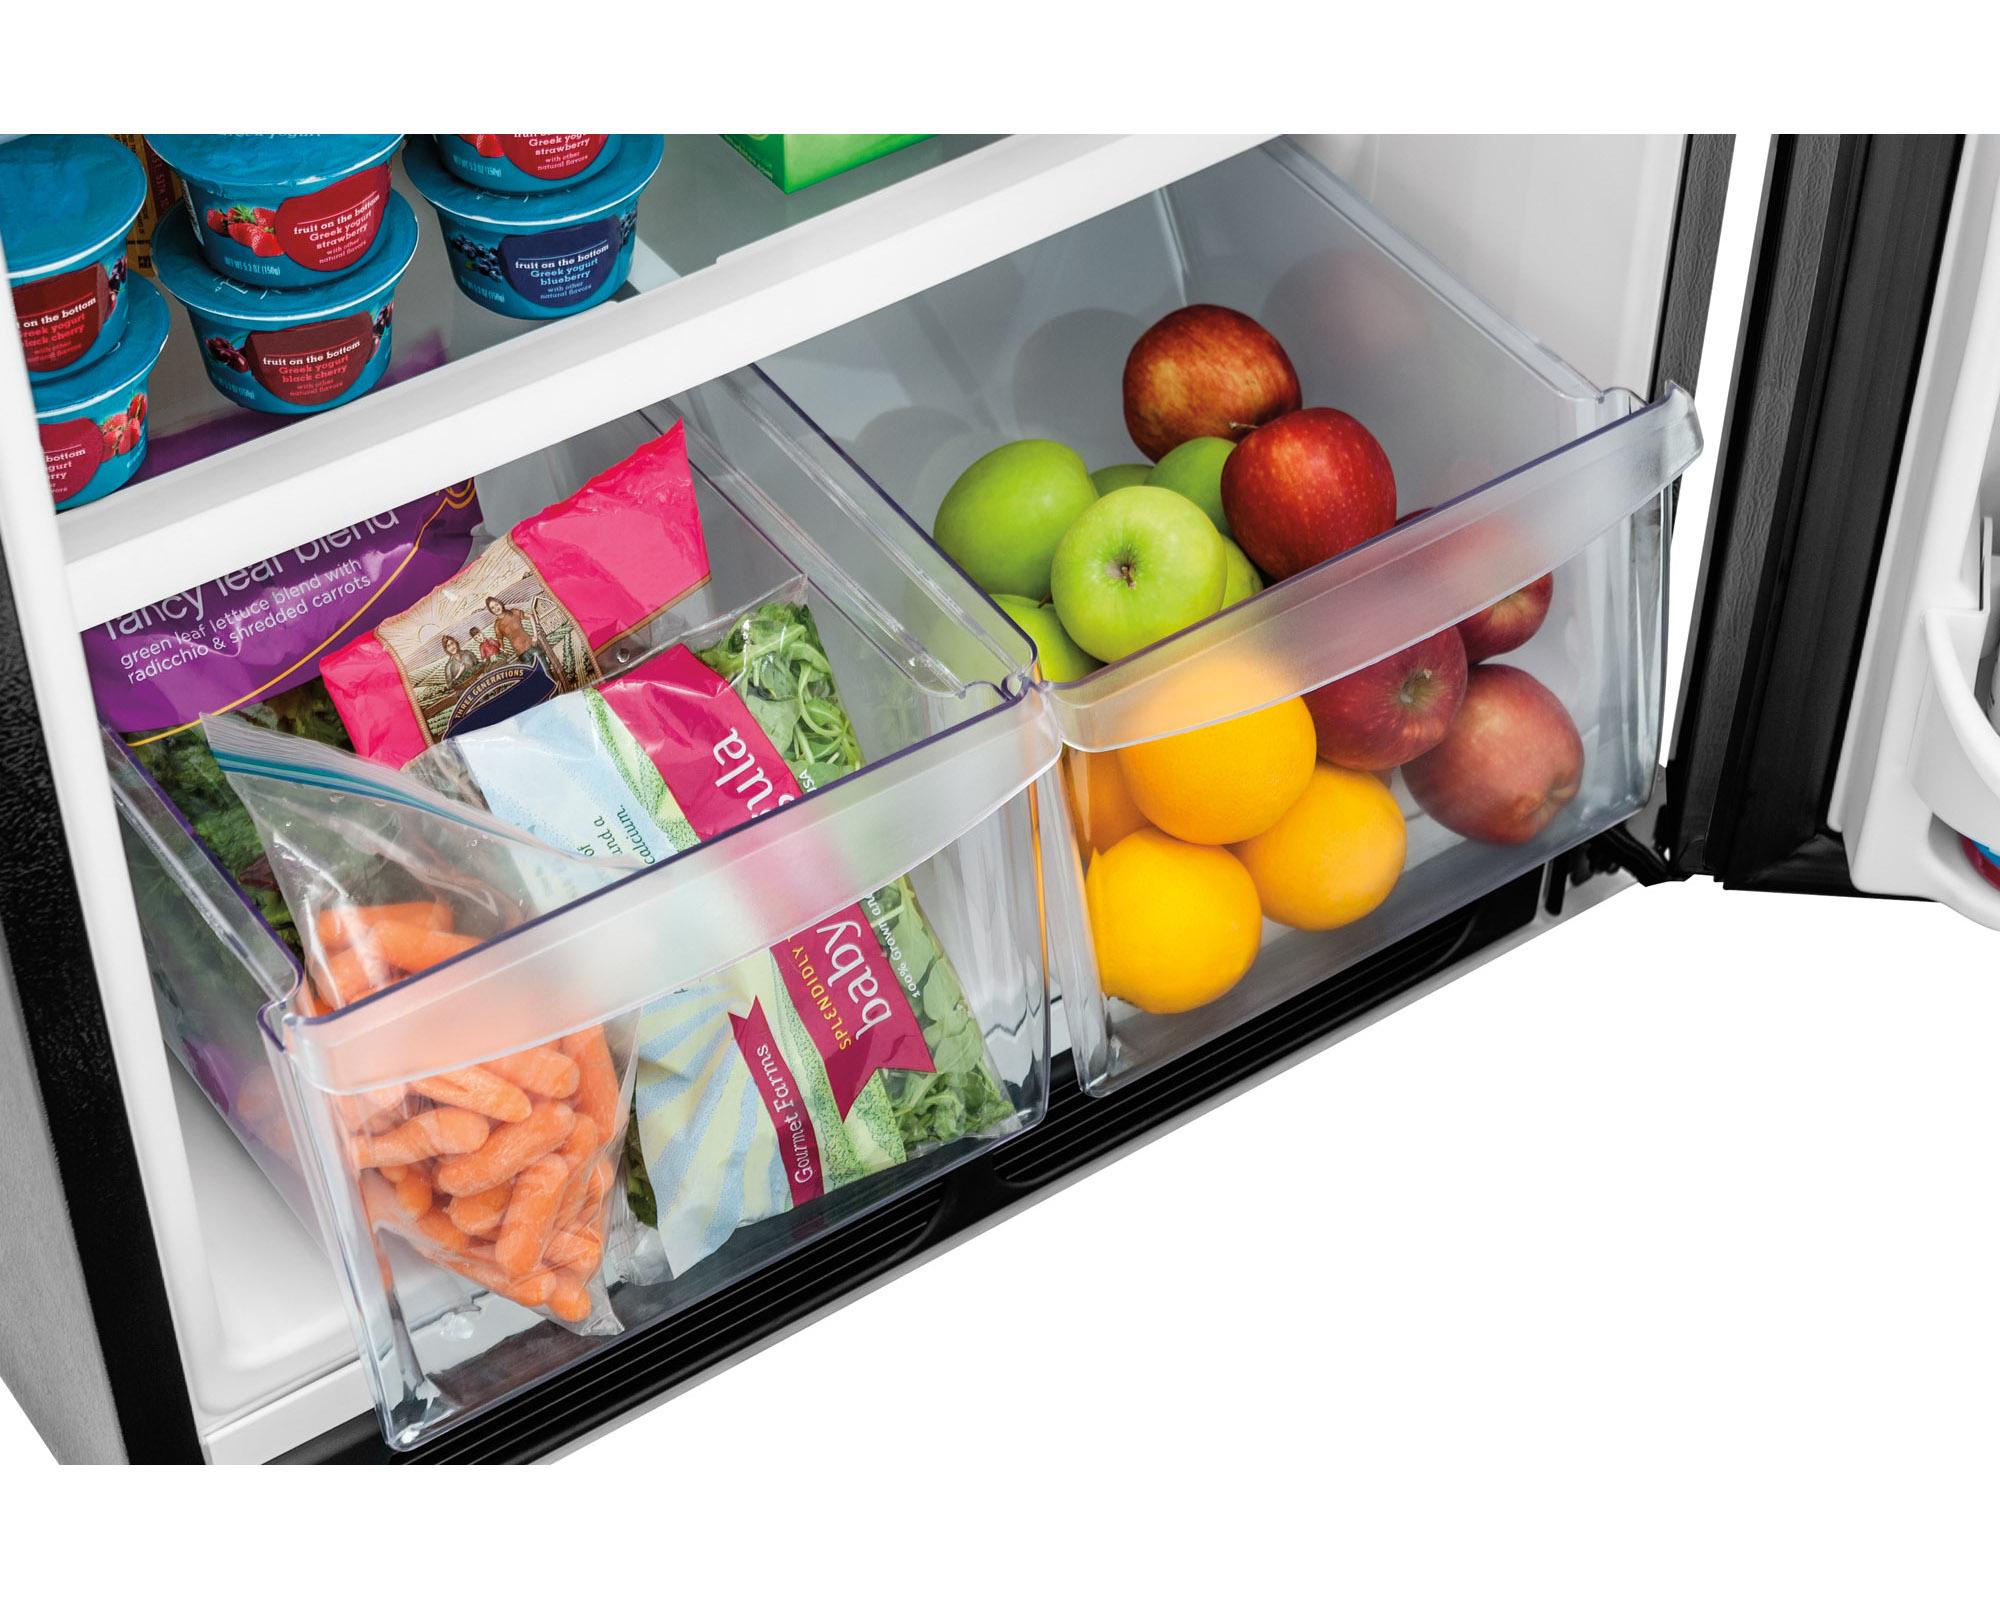 Frigidaire FFHT1621QB 16.3 cu. ft. Top-Mount Refrigerator - Black